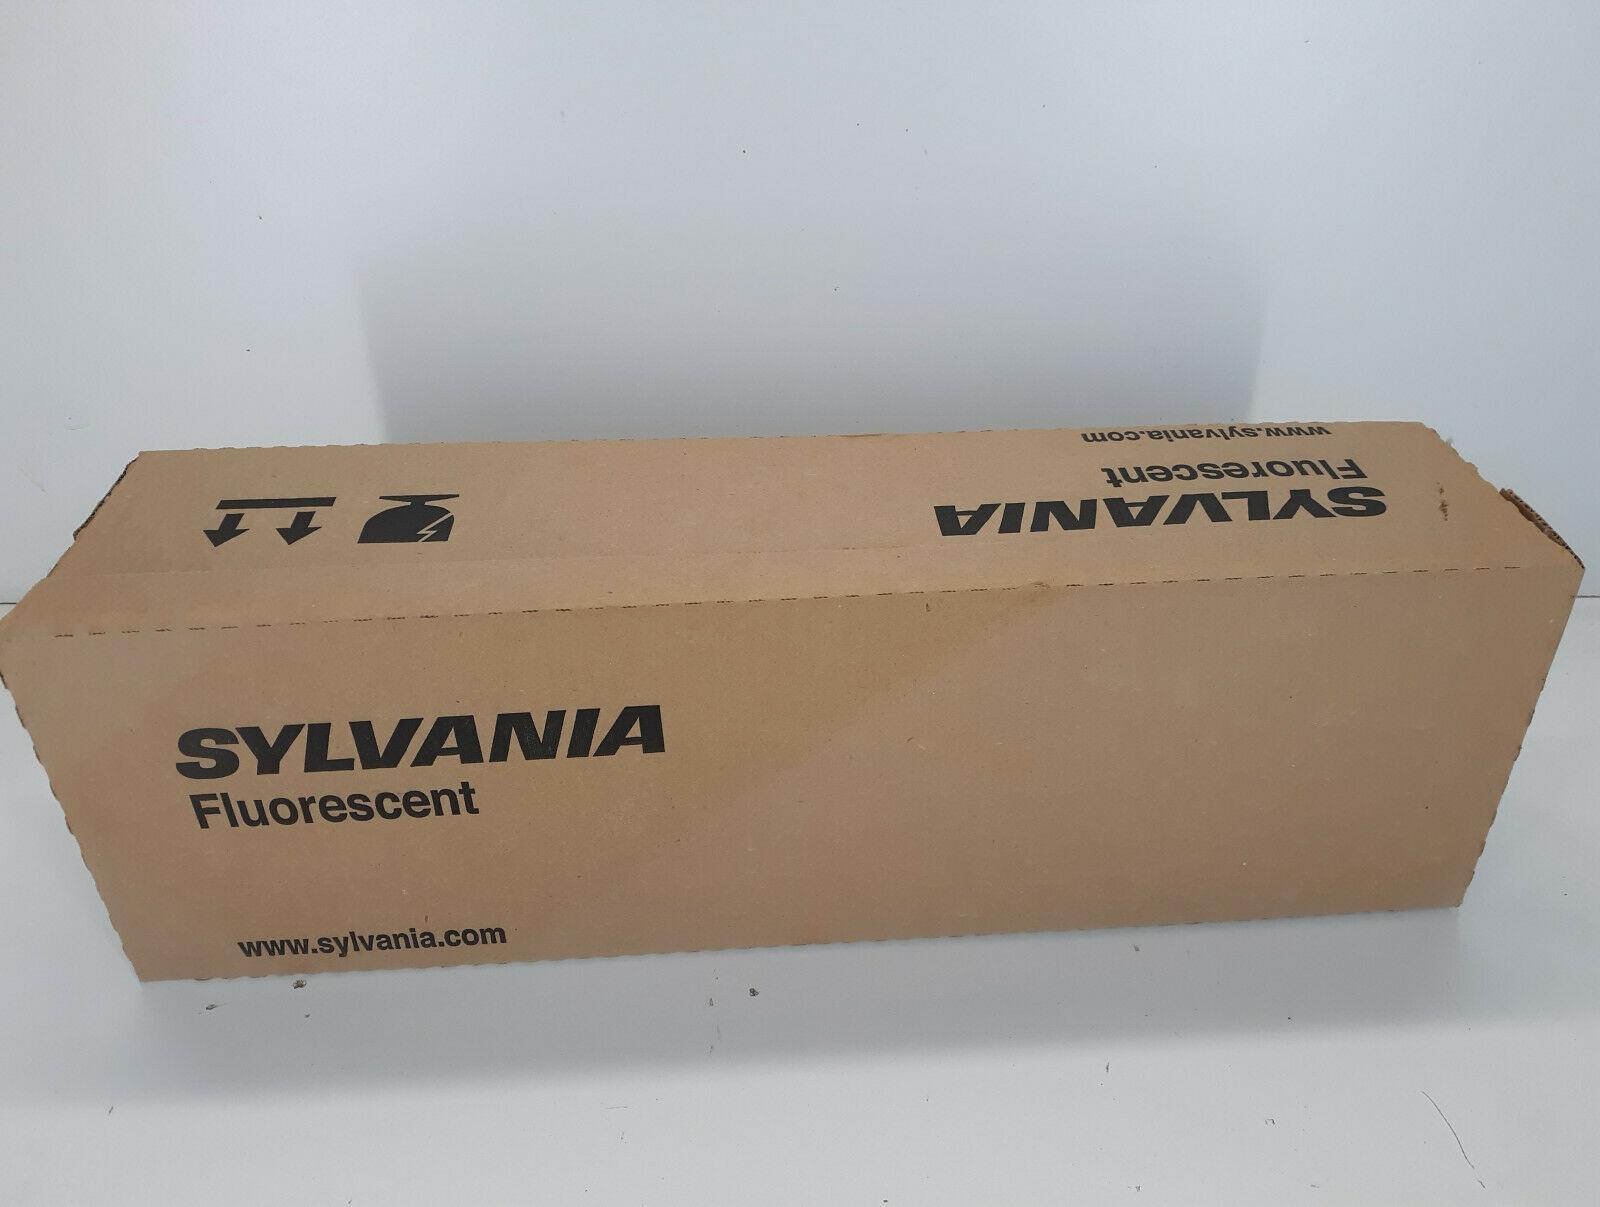 Sylvania FO17/835/ECO3  3 OCTRON XP Lamp Bulb 3500K F17T8 30pcs - $38.00